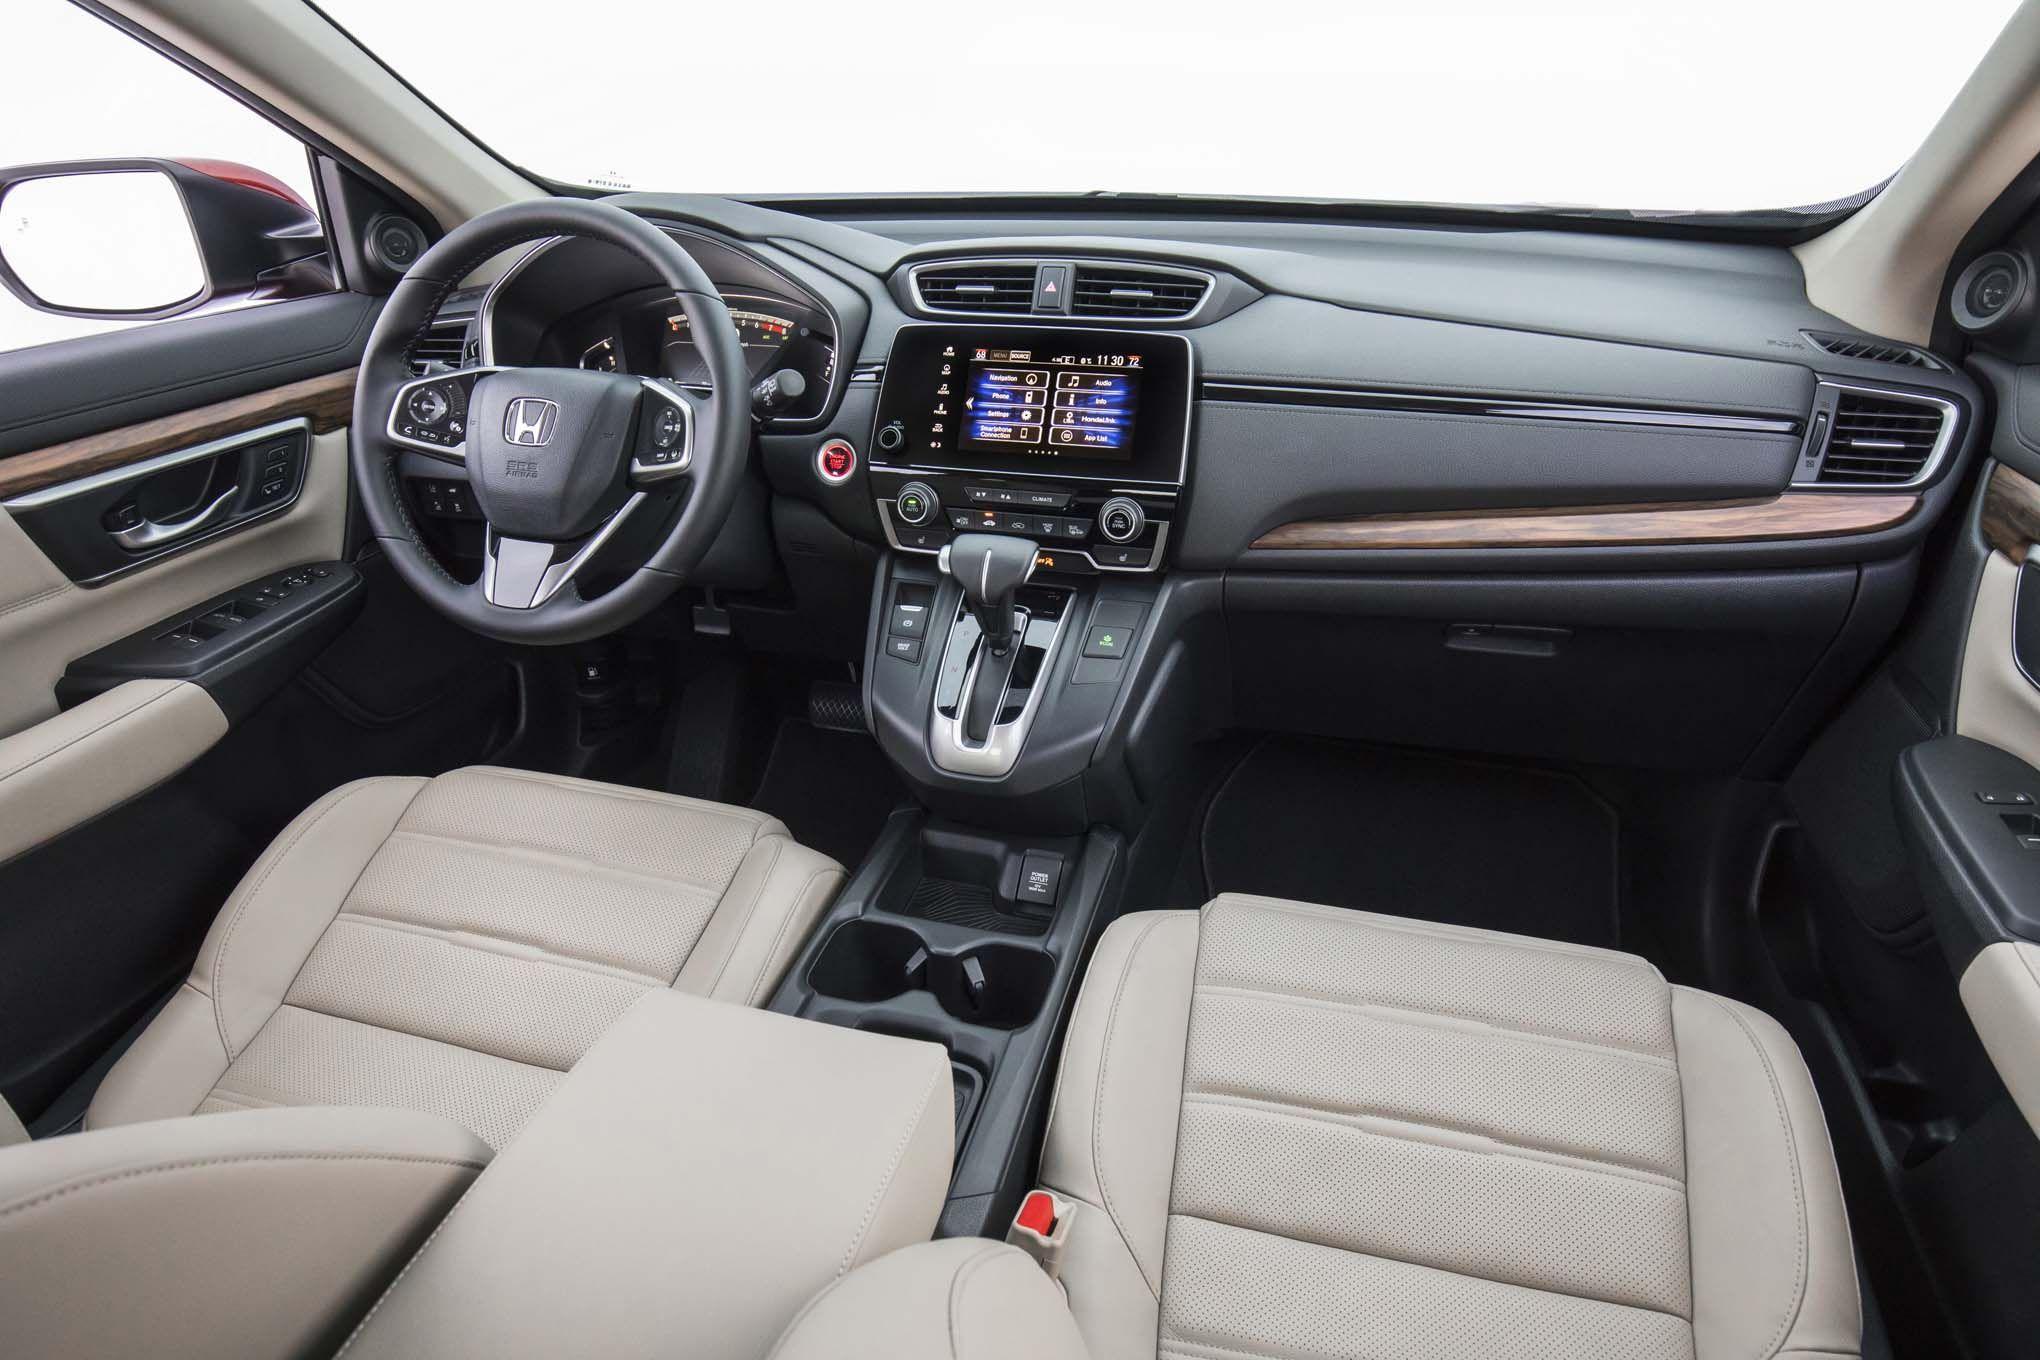 Image result for honda crv Honda crv interior, Honda crv